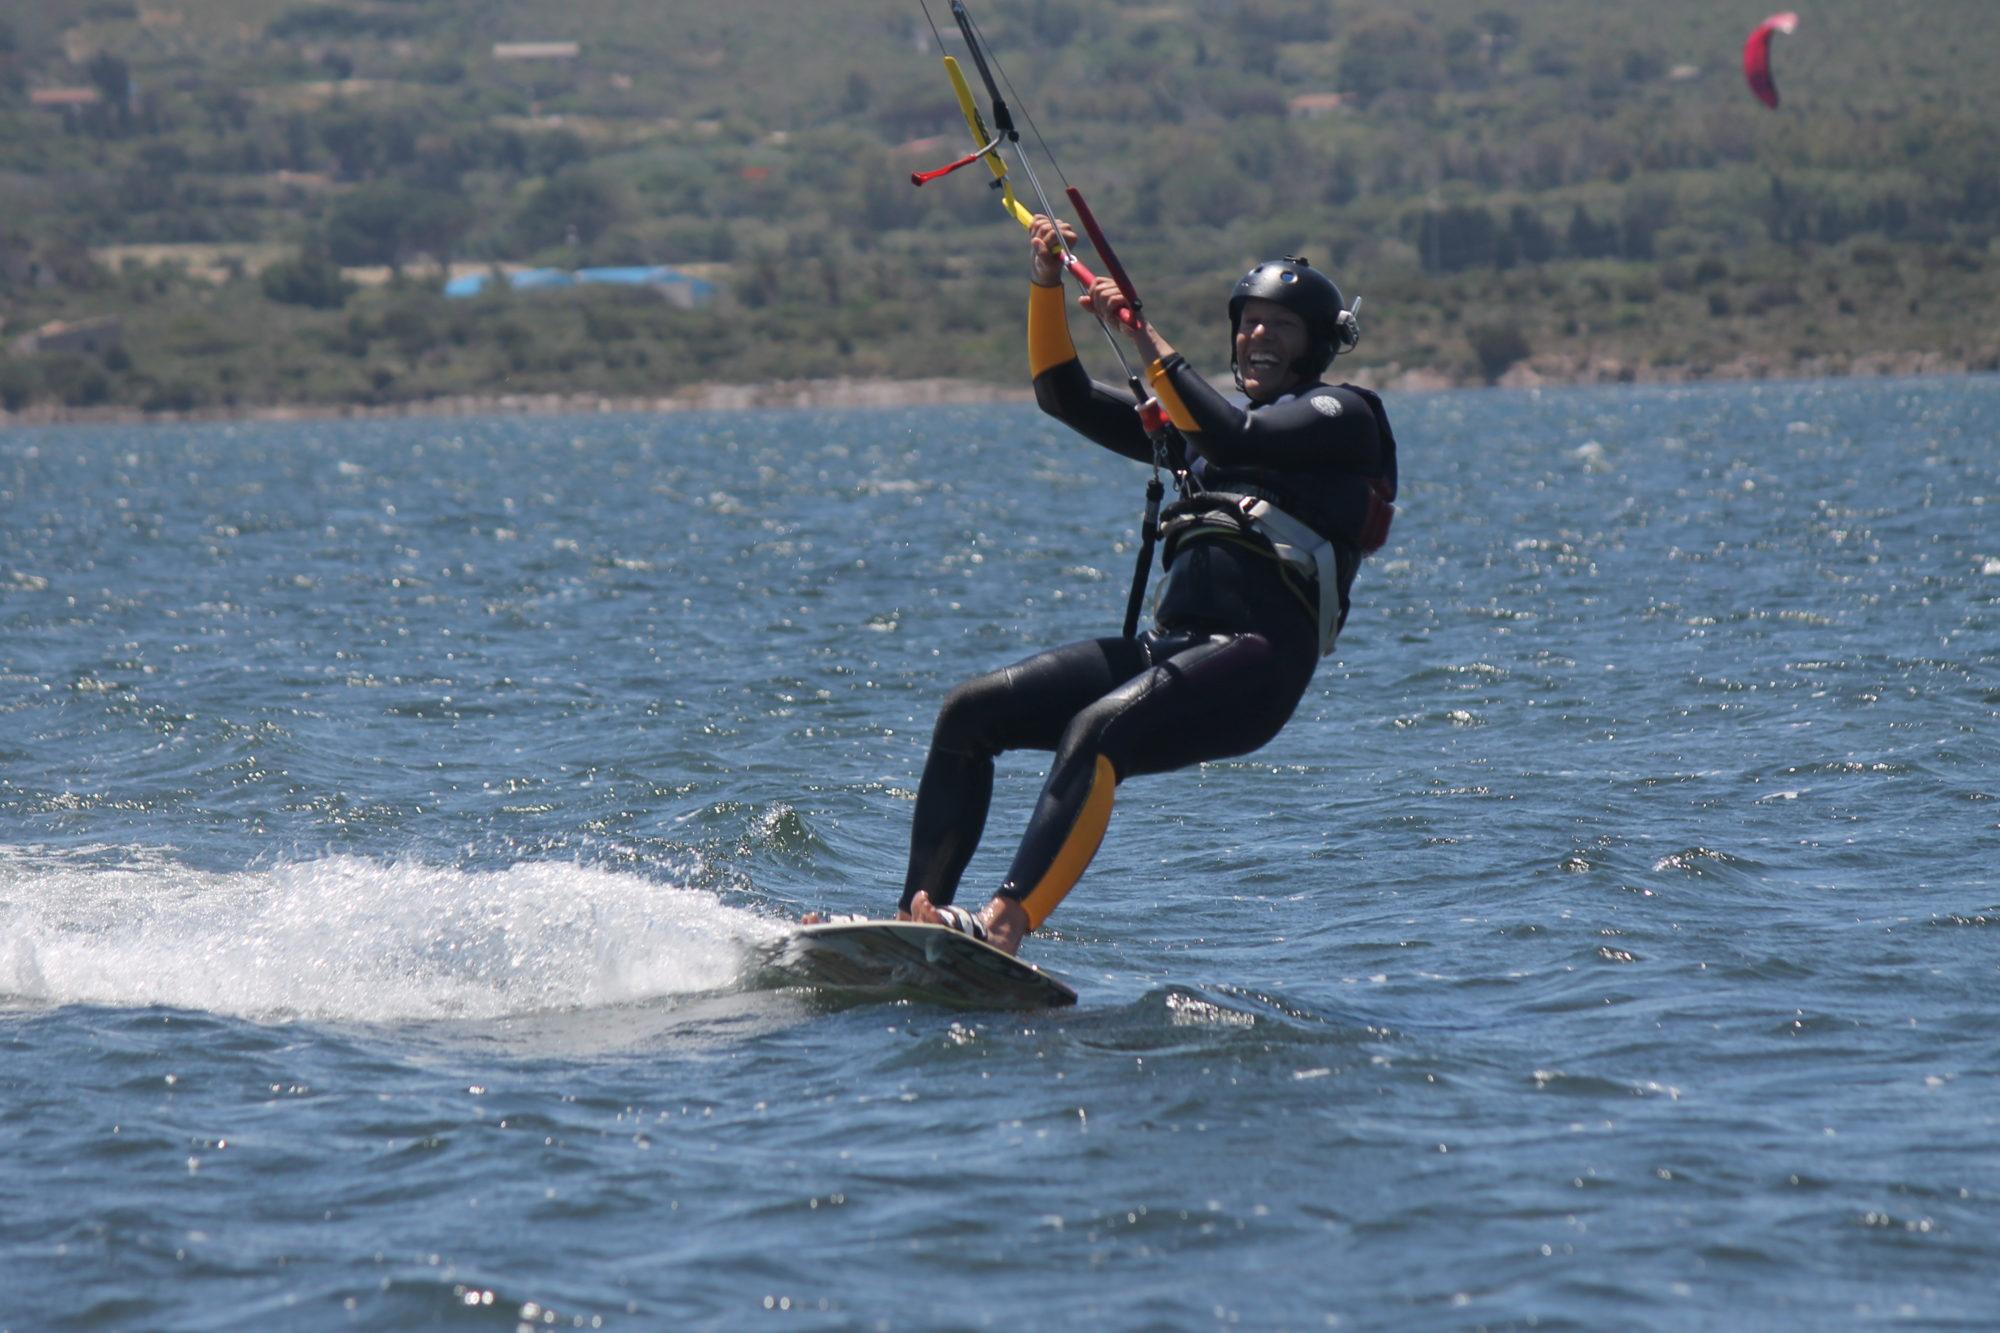 Zero to Hero Kitesurfing Course in Sardinia: Learn to kitesurf in Sardinia and become an independent kiters